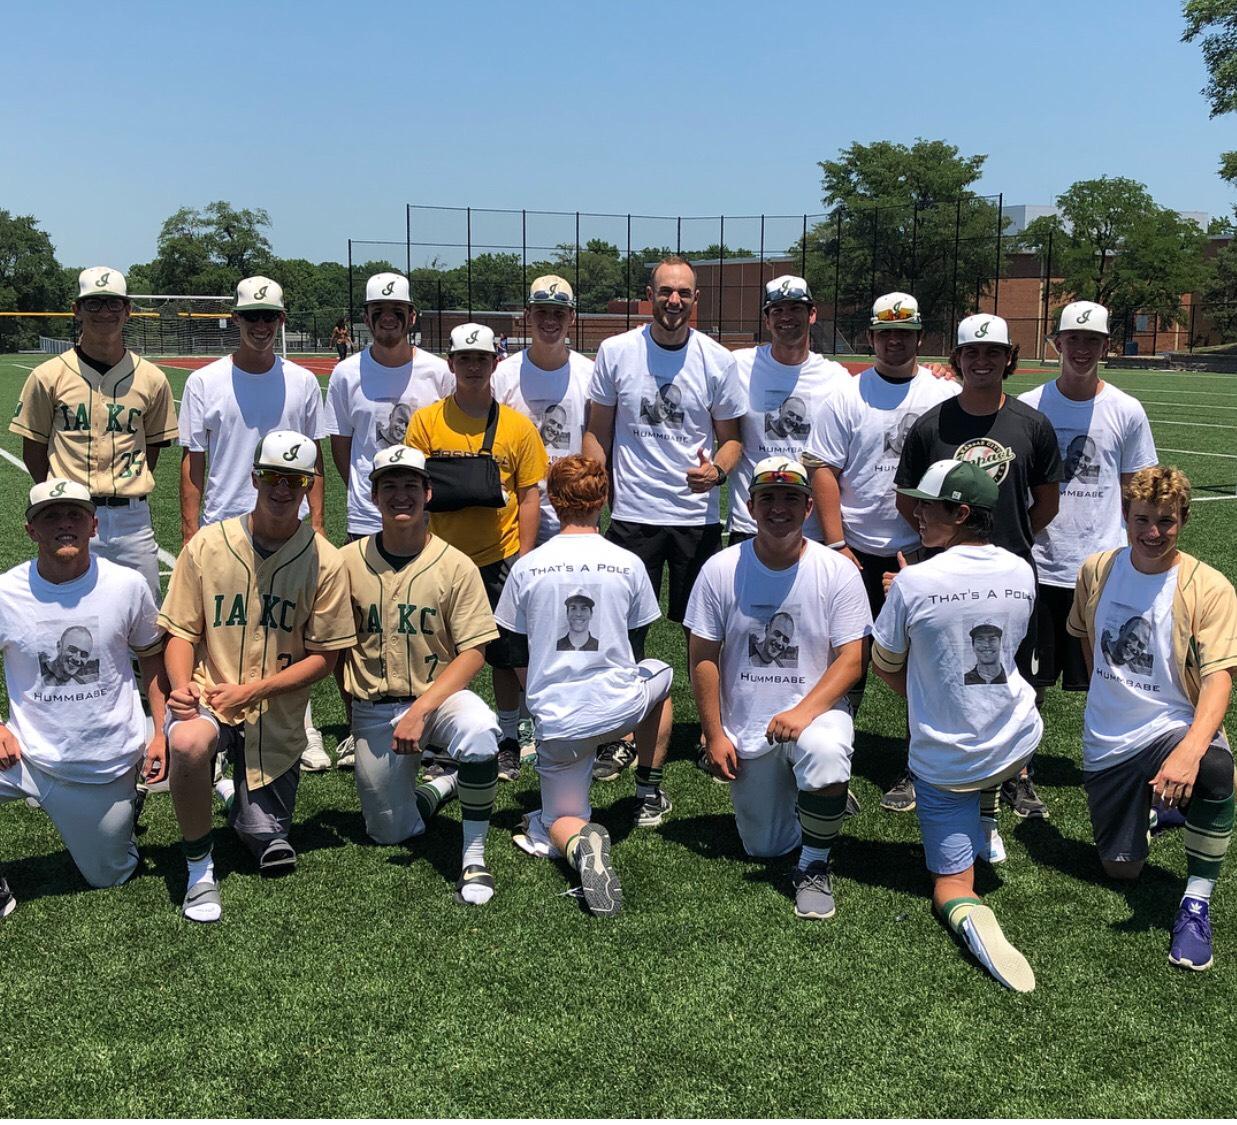 Custom T Shirts For Kansas City Impact Athletes 18u Baseball Team